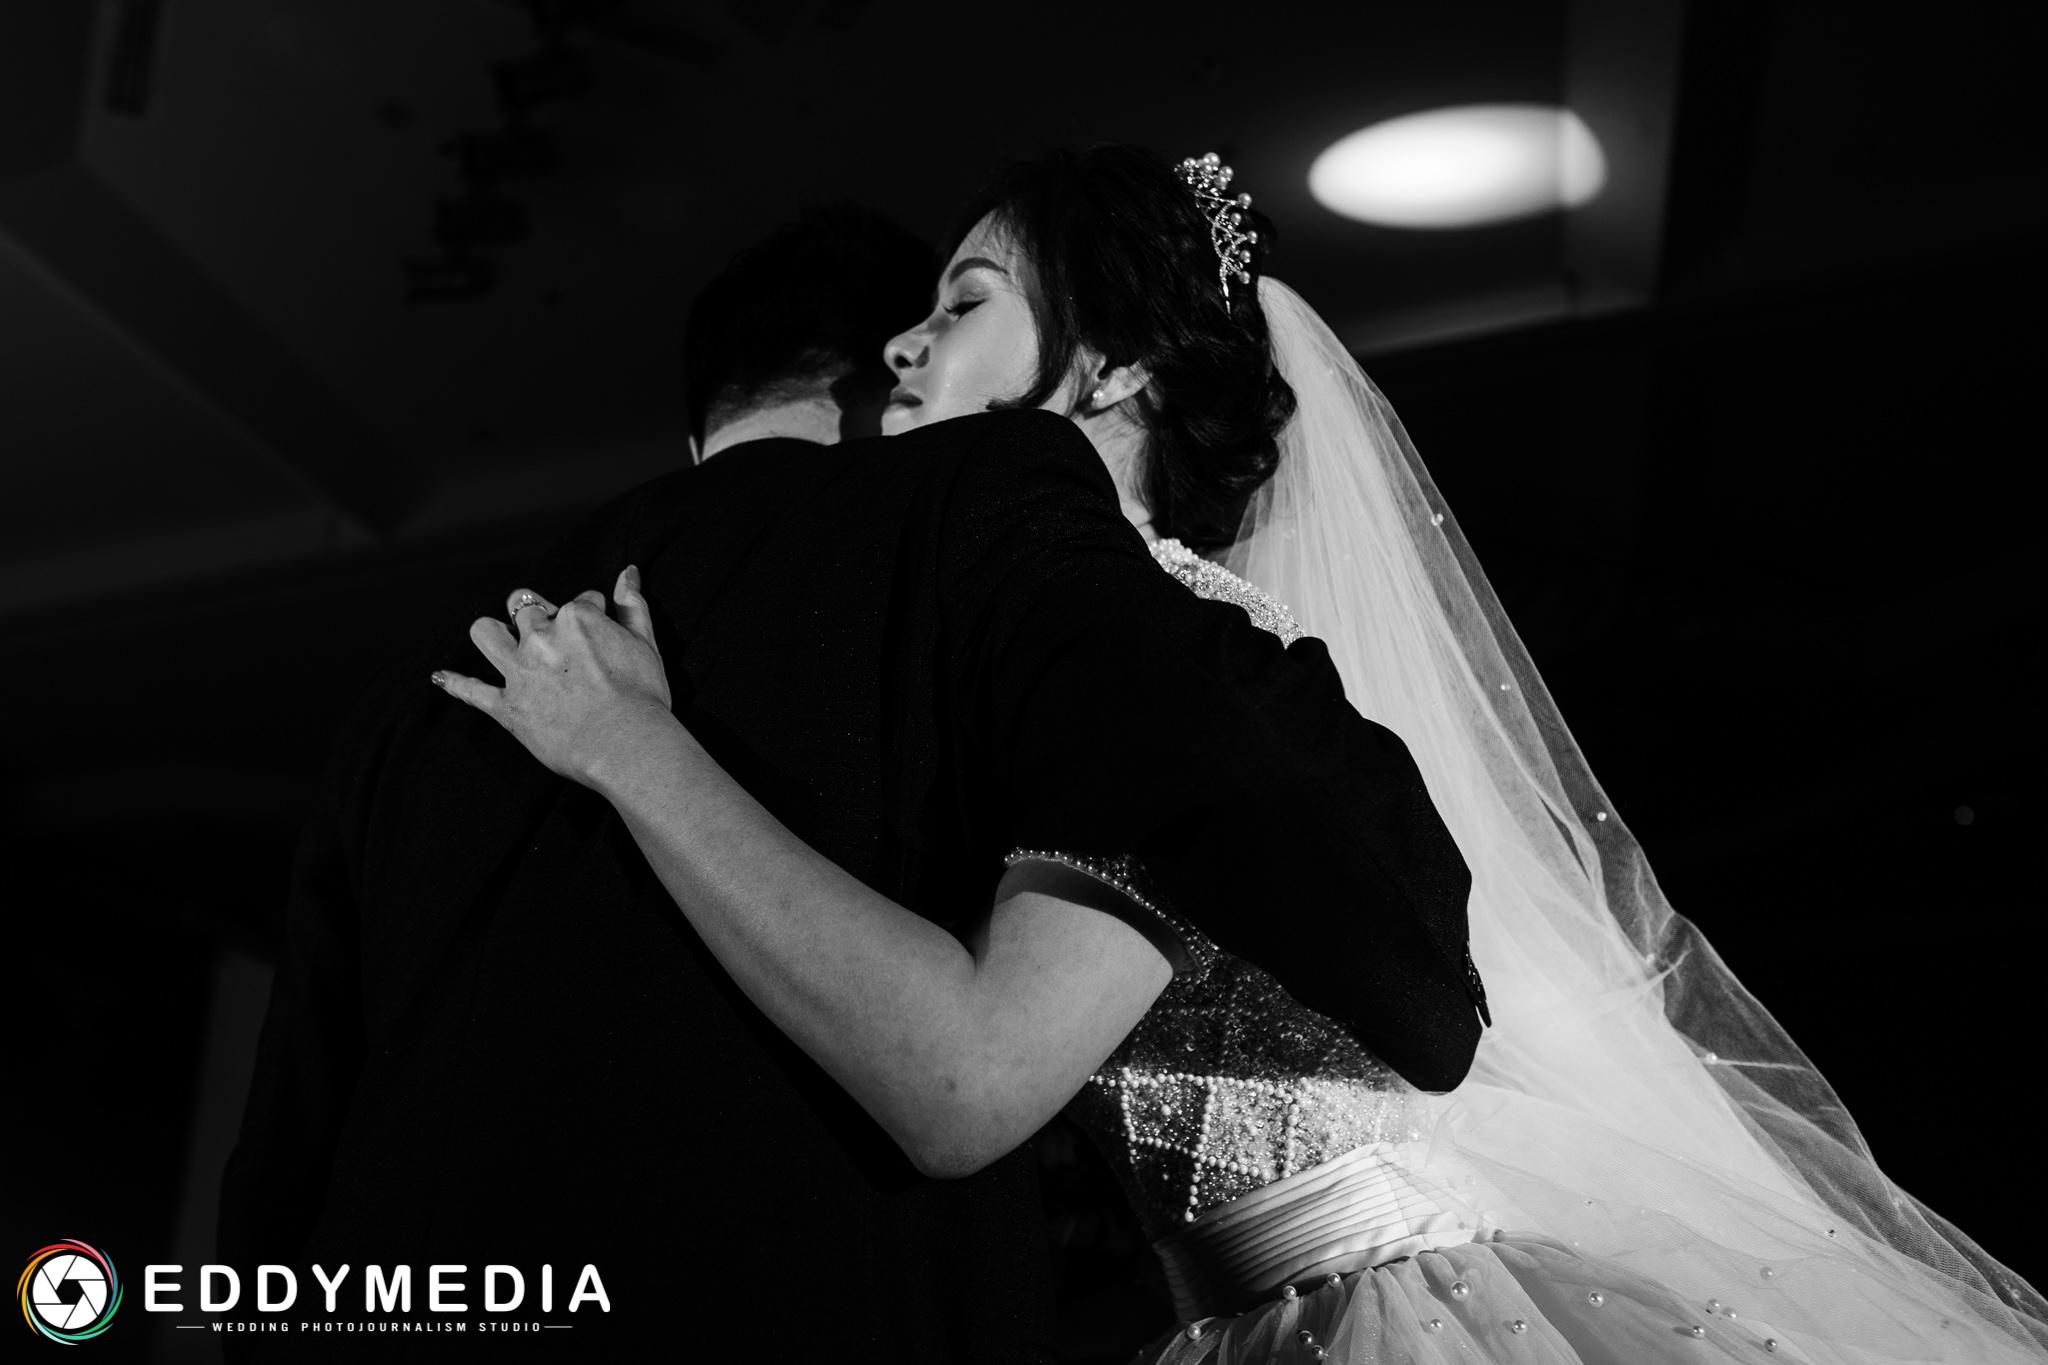 Phongsucuoi Melia MinhThanh MaiAnh Eddy 88 lấy vợ bằng tuổi